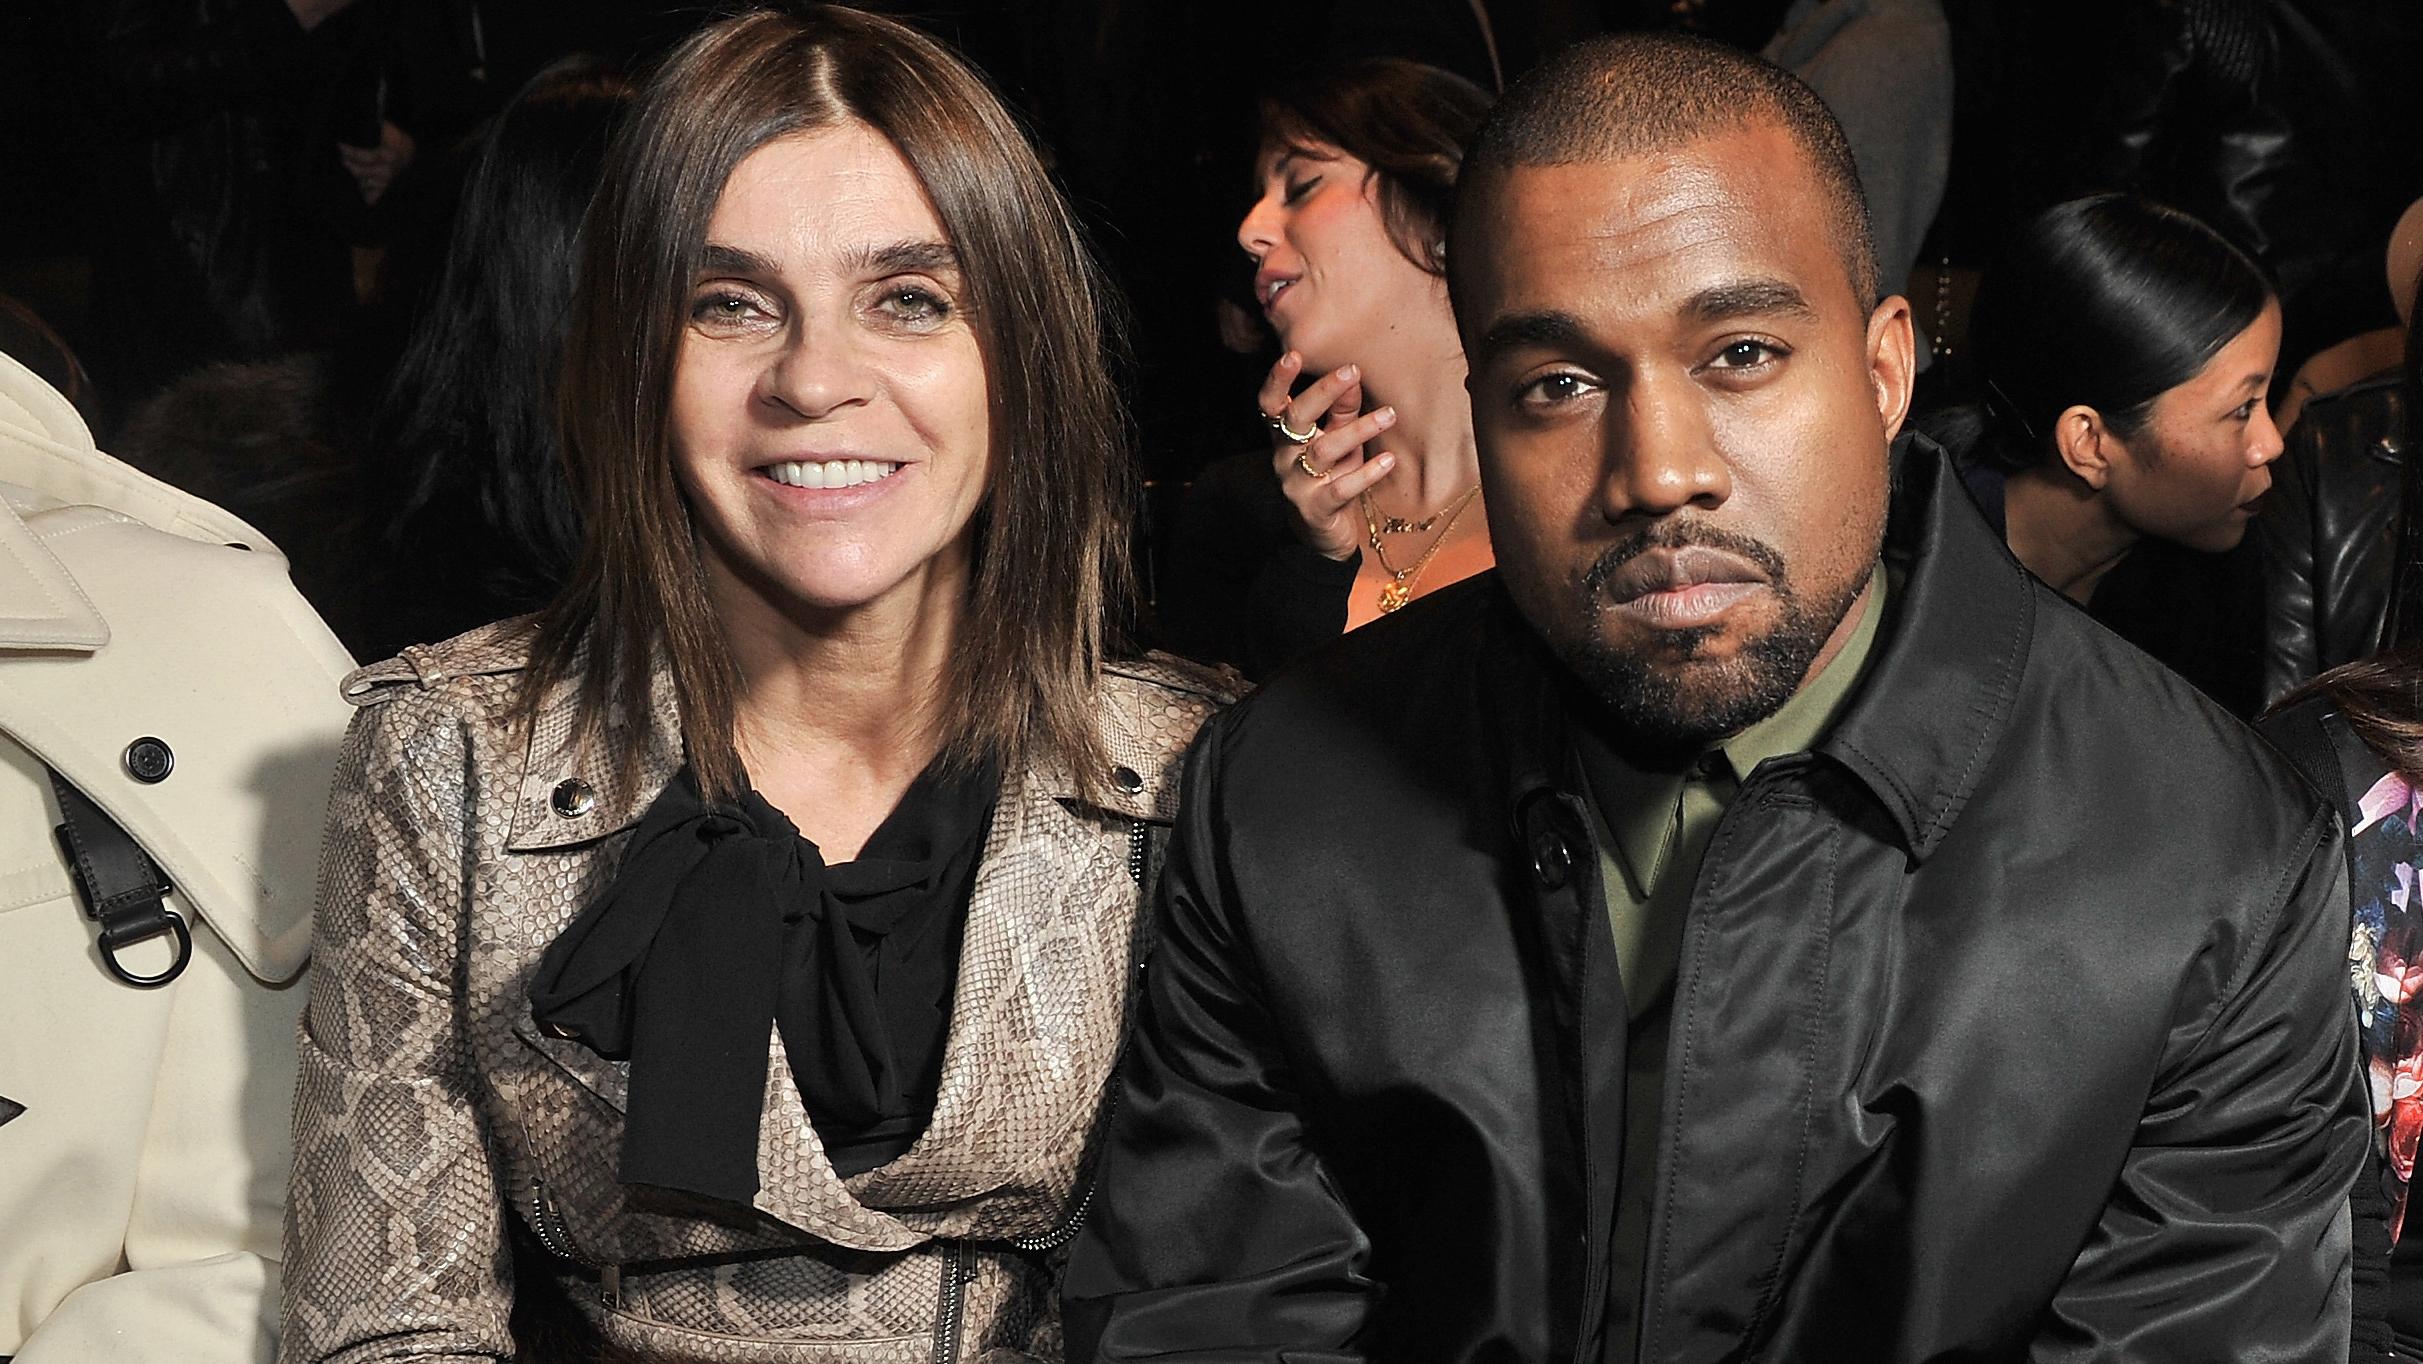 Kanye West's Yeezy 3 fashion shoutouts